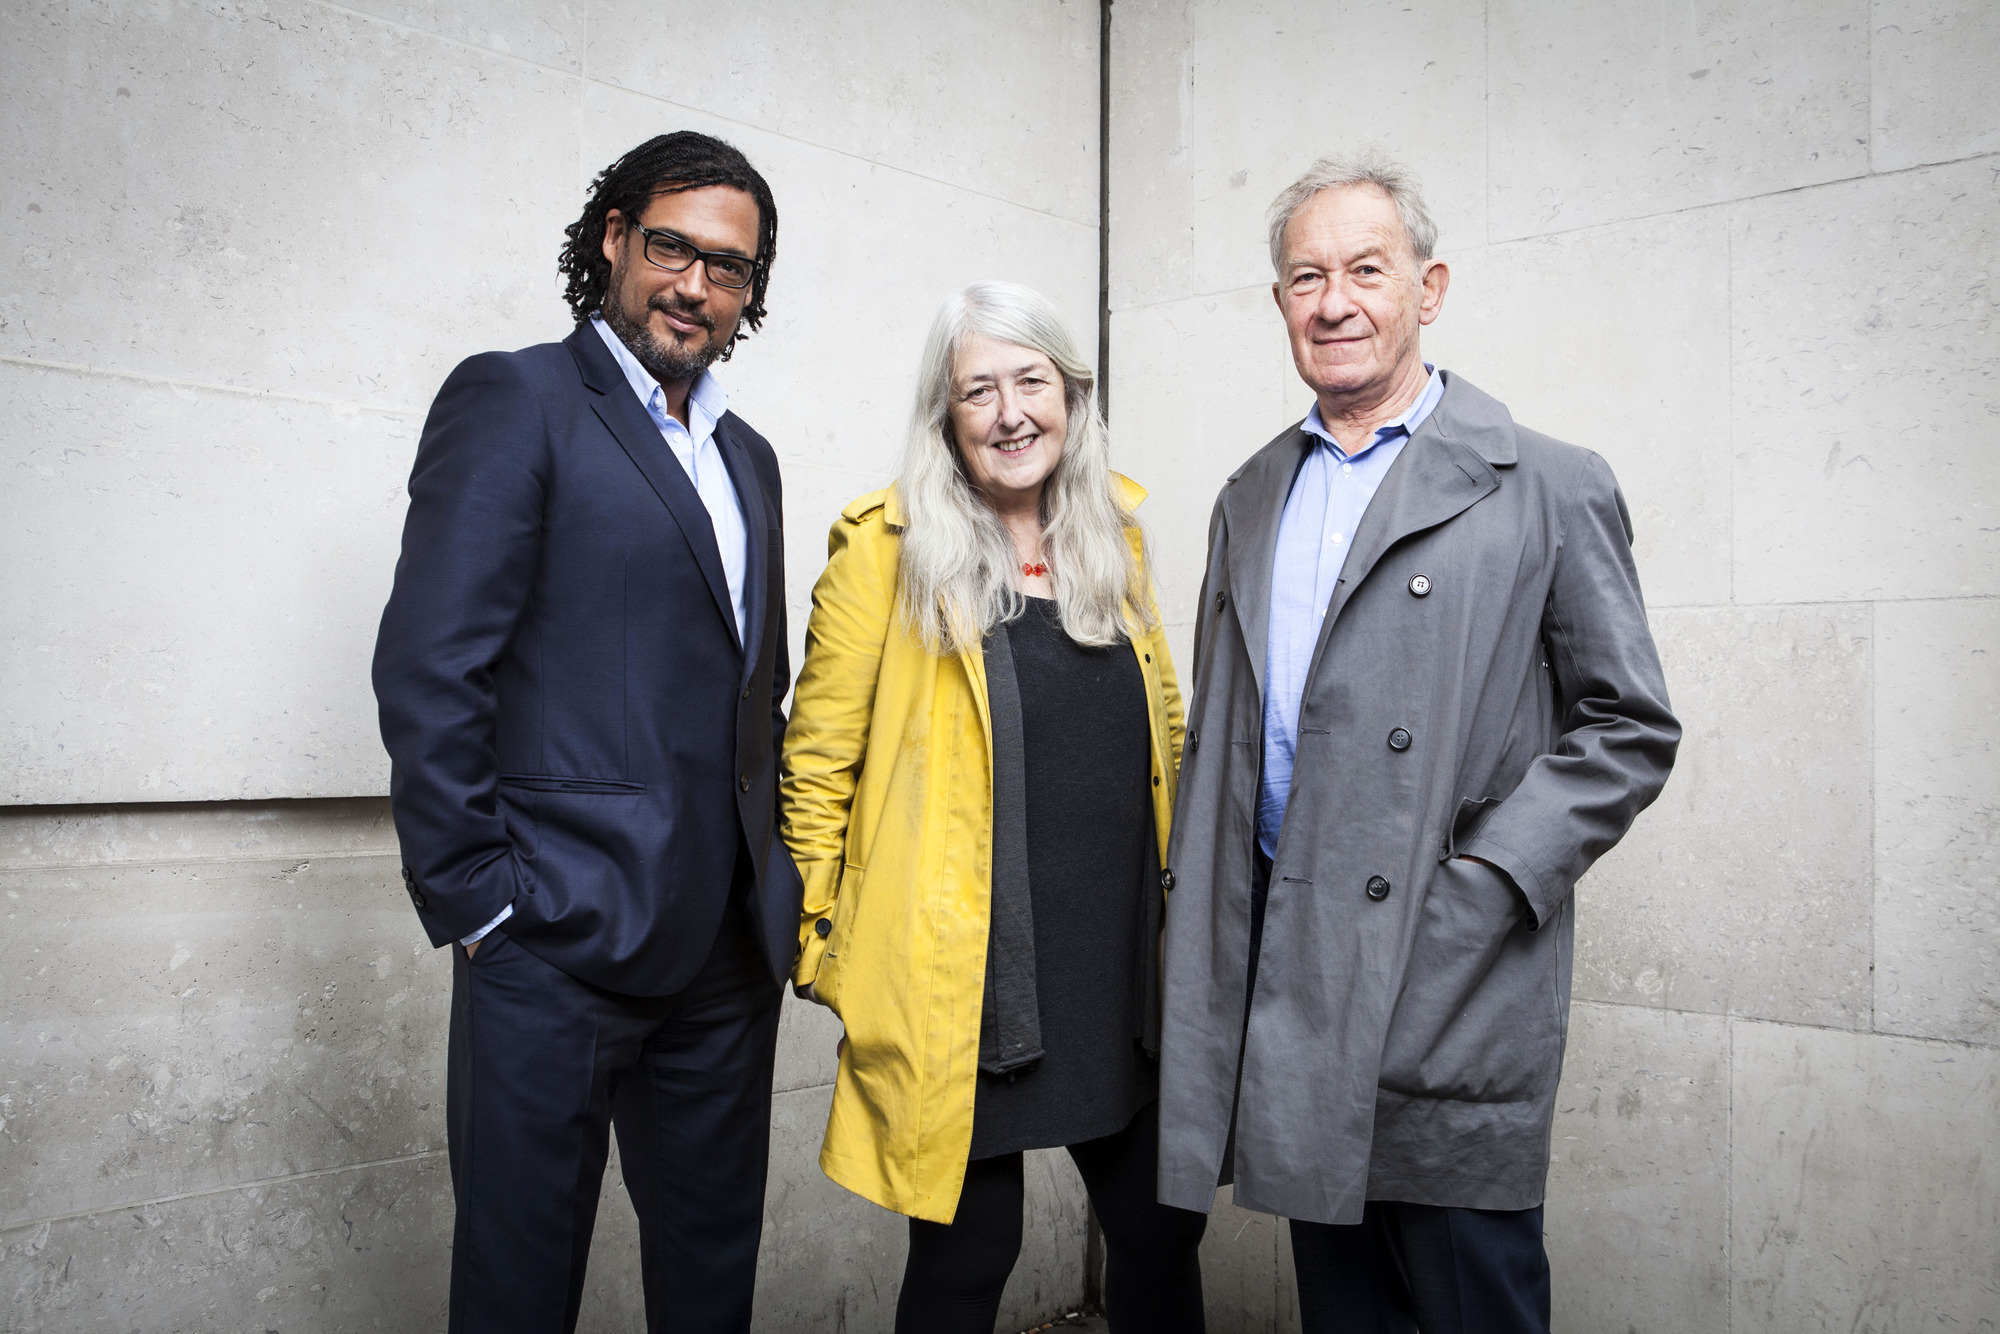 David Olusoga, Mary Beard, Simon Schama. Photographer: Andrew Hayes-Watkins